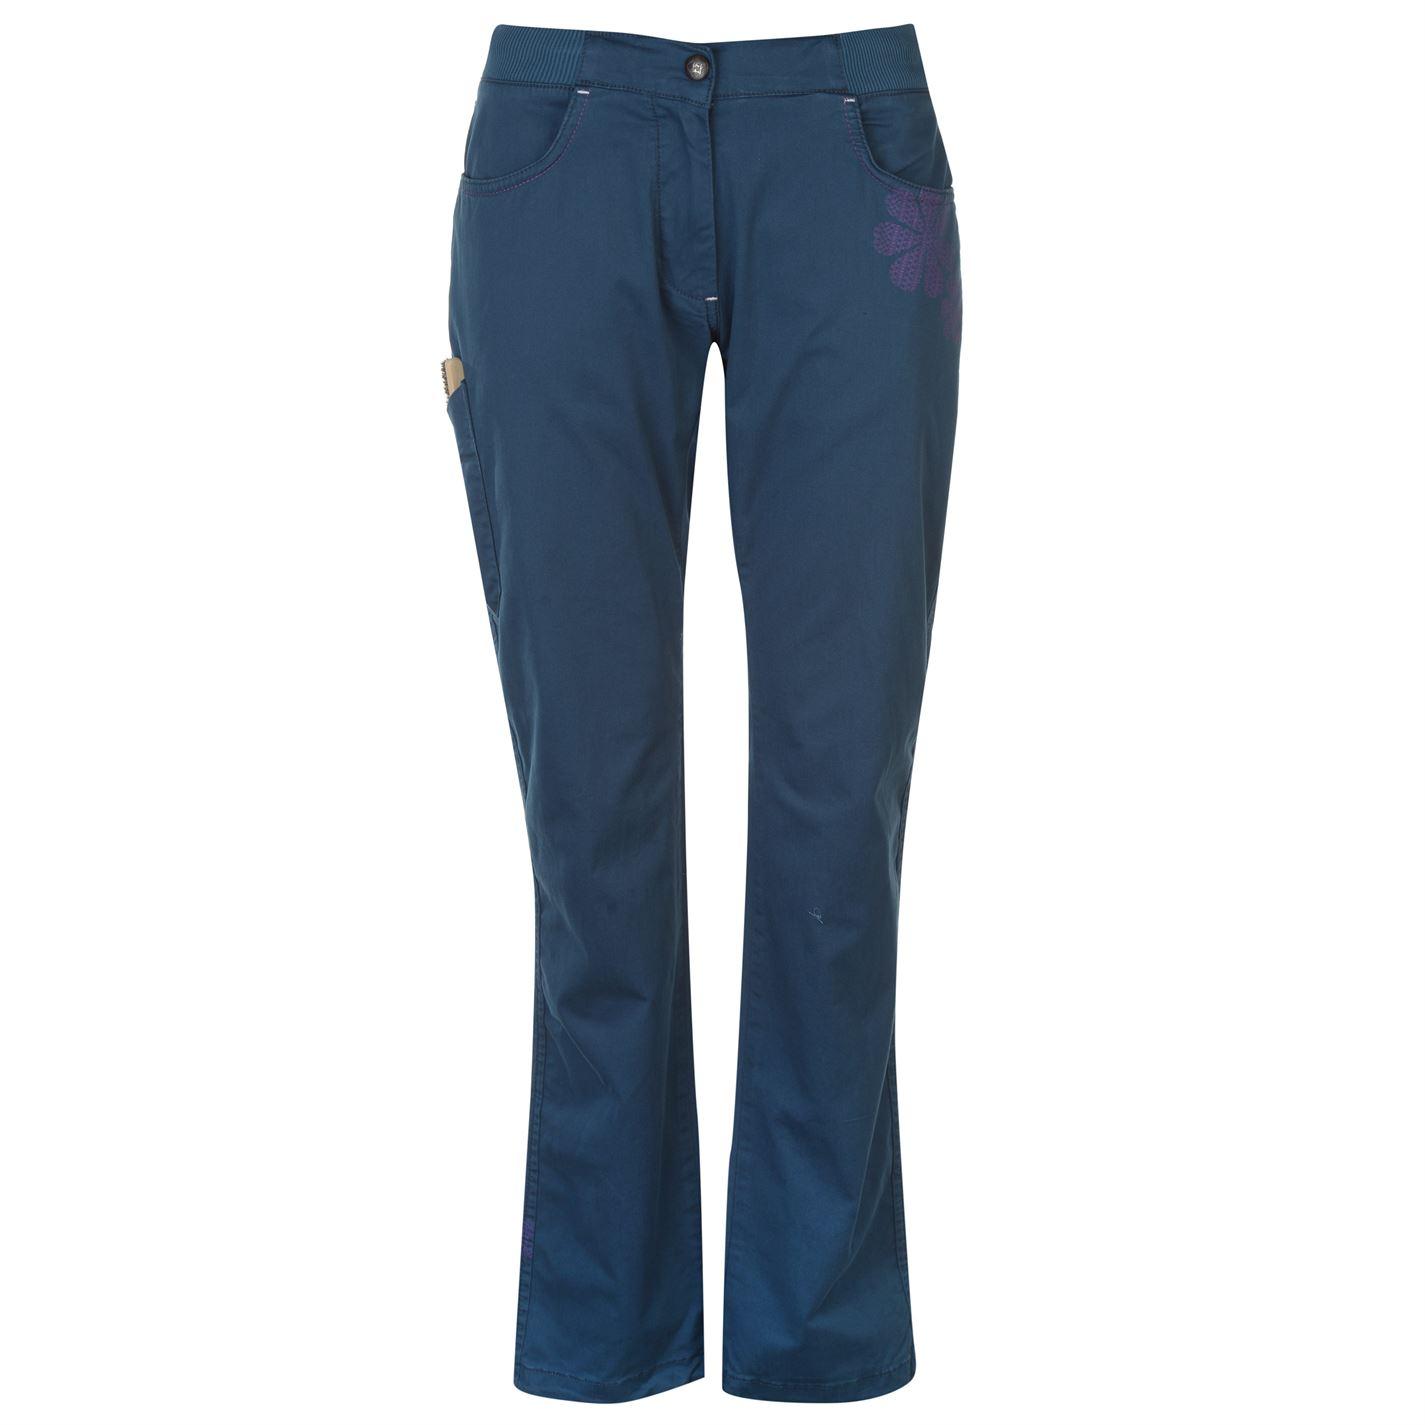 Chillaz Jessy Pants Ladies